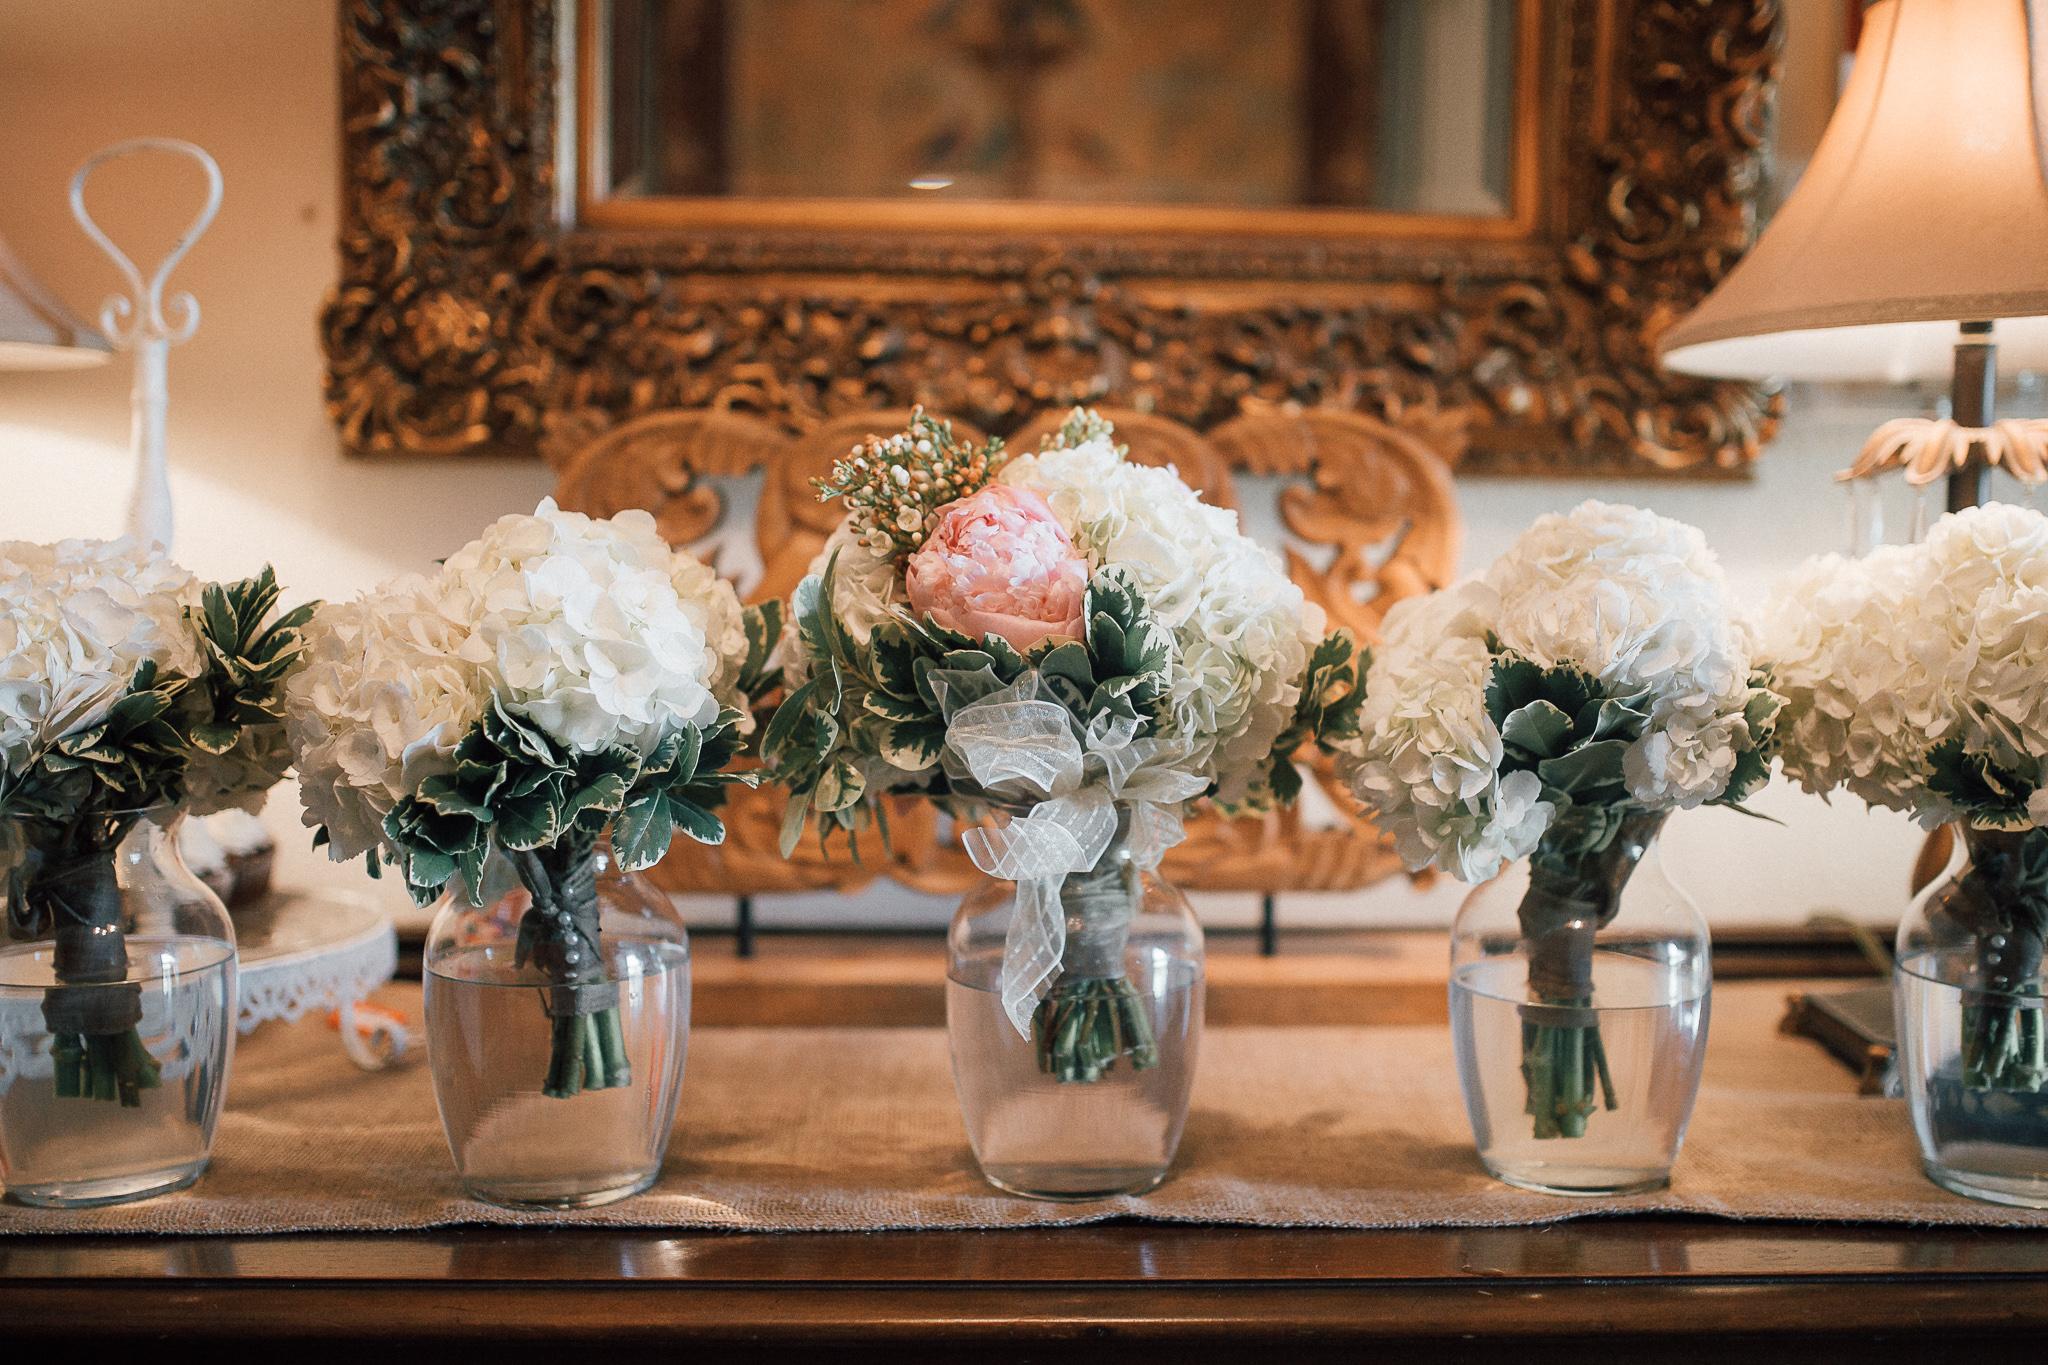 cassie-cook-photography-memphis-wedding-photographer-fountain-south-inn-olive-branch-ms-hernando-flower-shop